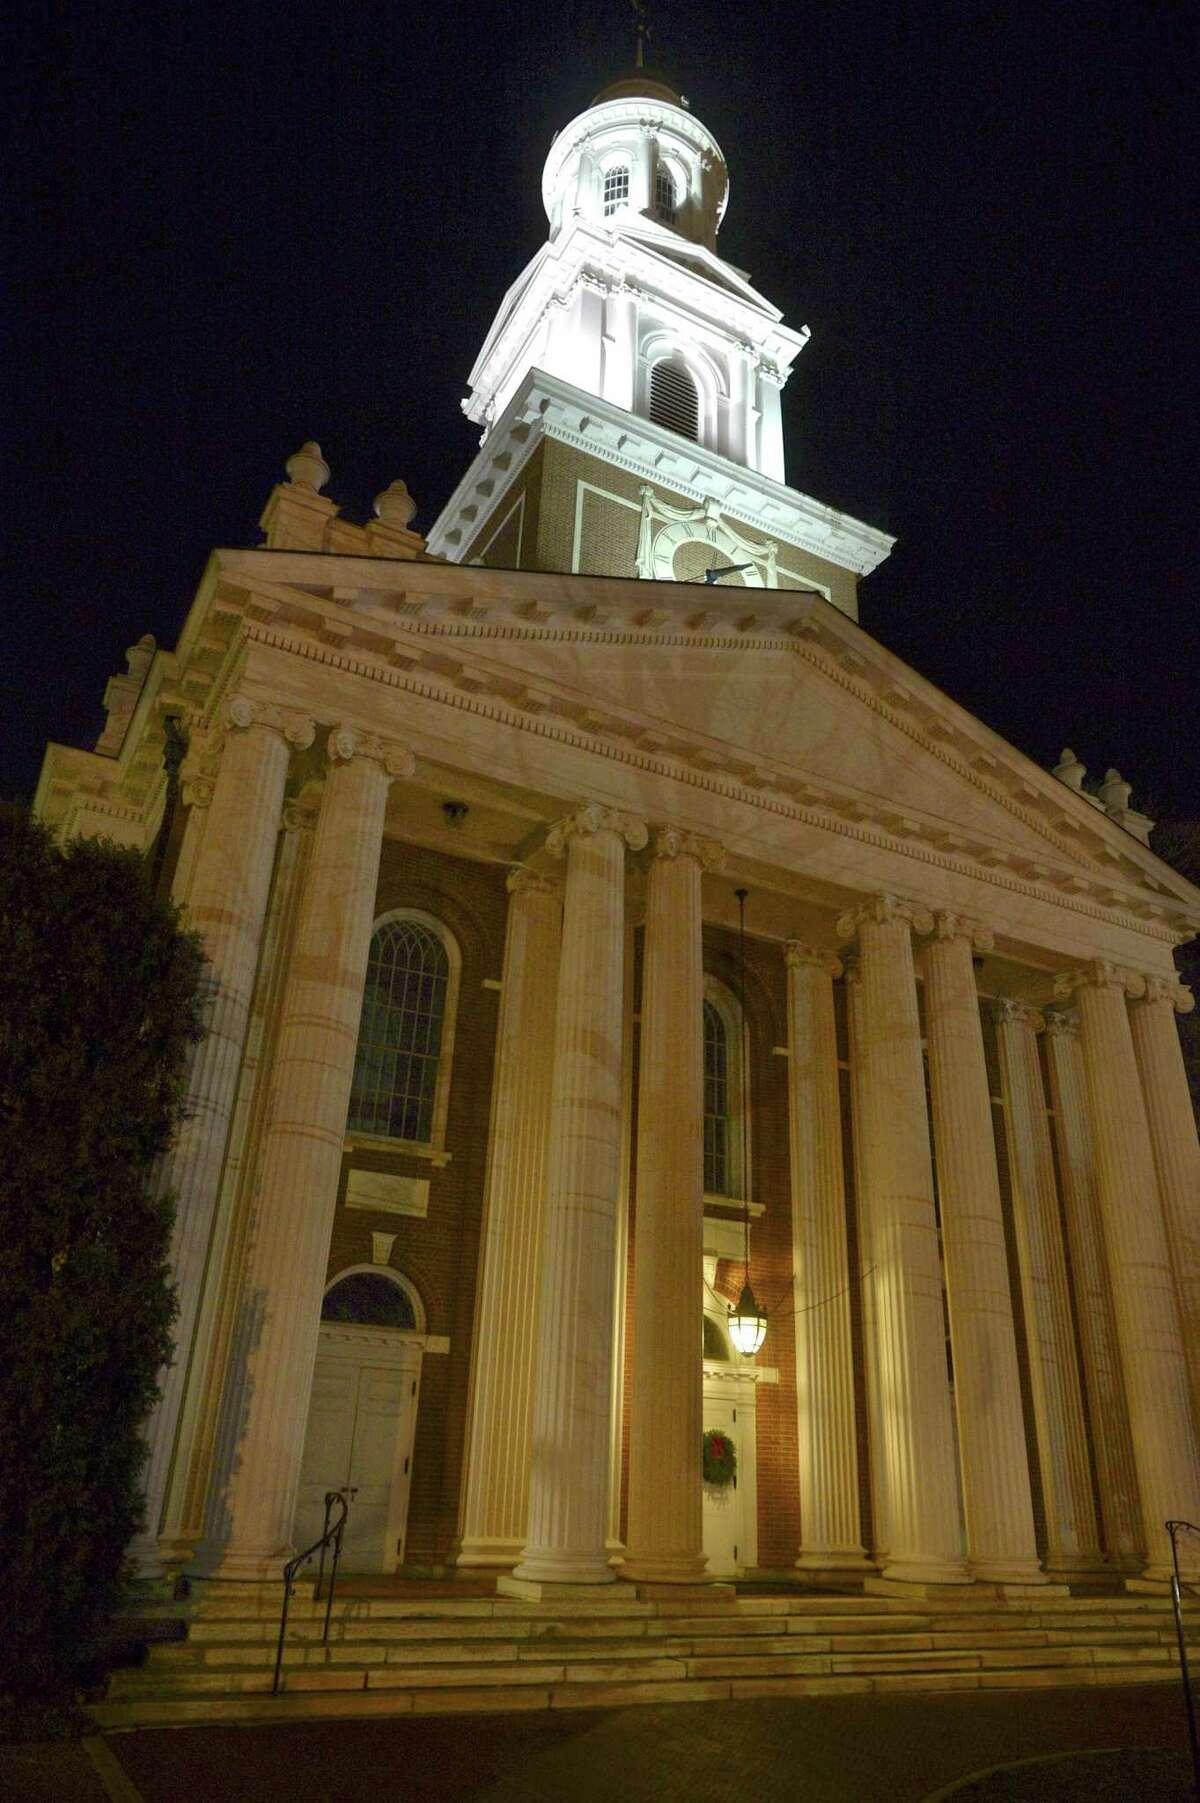 First Congregational Church of Danbury. Wednesday, December 12, 2018, in Danbury, Conn.